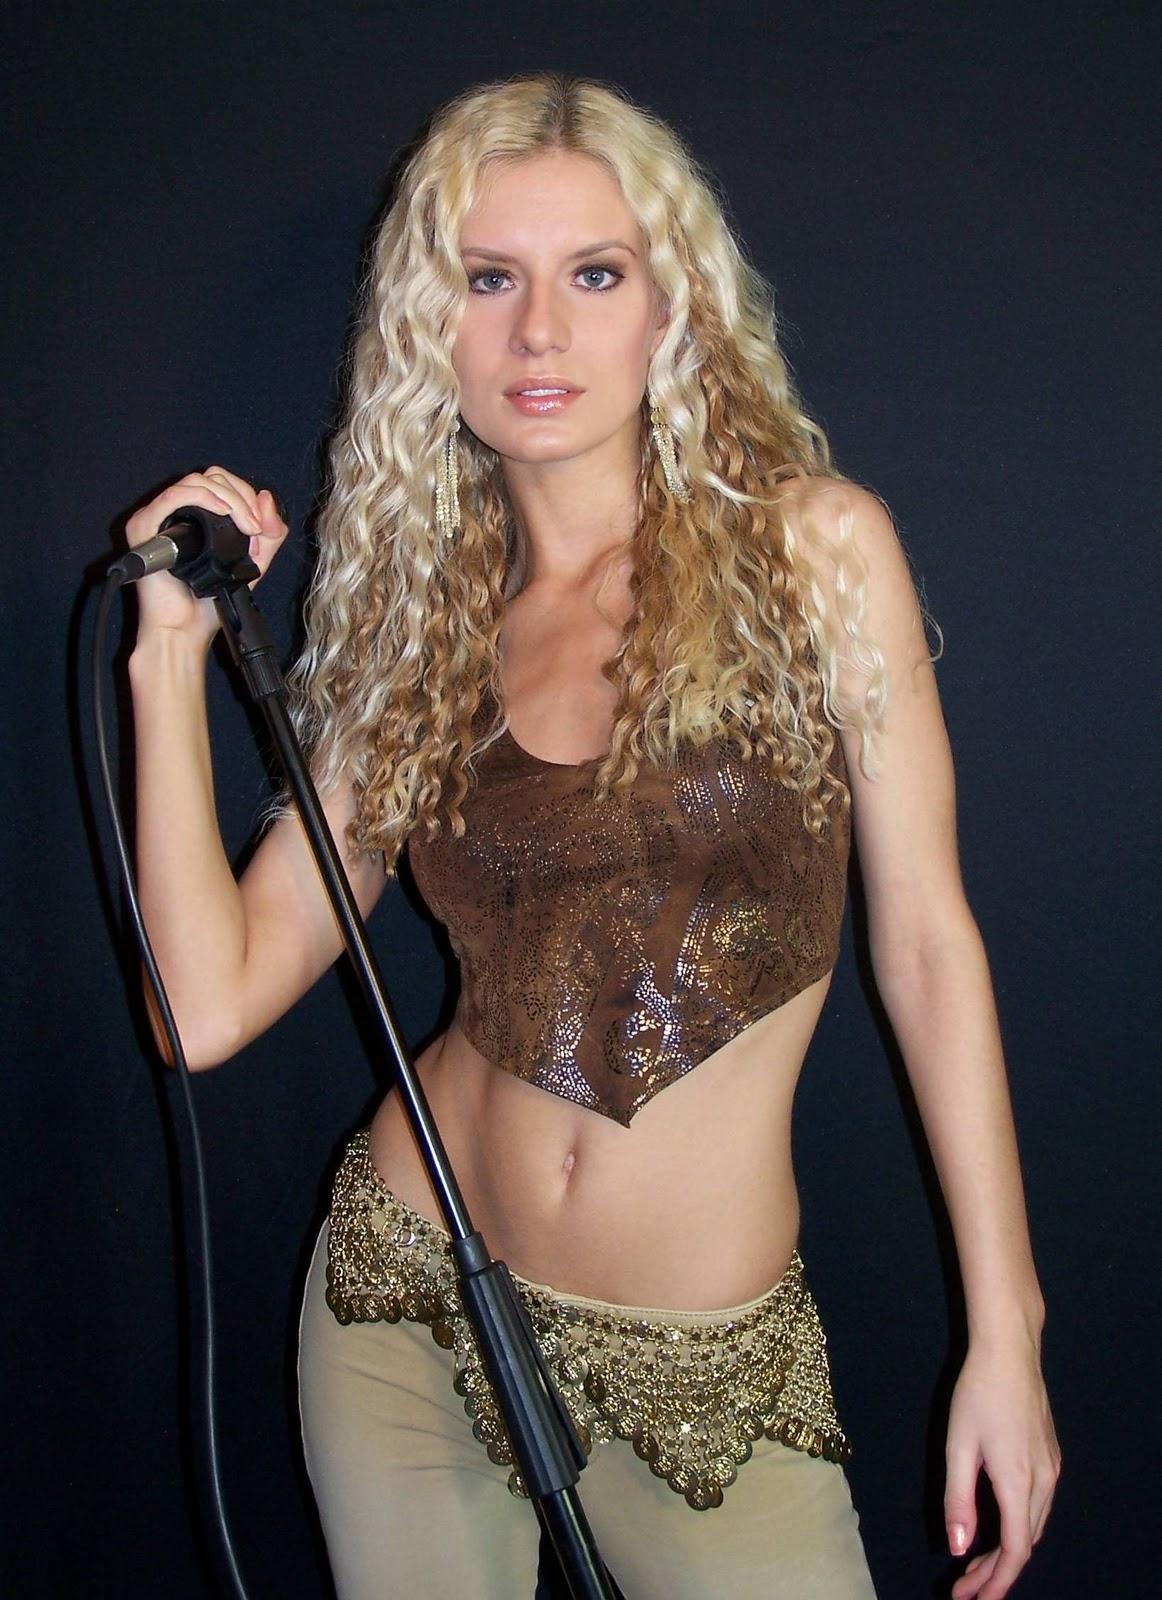 http://4.bp.blogspot.com/-Rycc1f4uYgg/TrNhpsjxRpI/AAAAAAAADNM/o_ju8clipis/s1600/Shakira_5.jpg